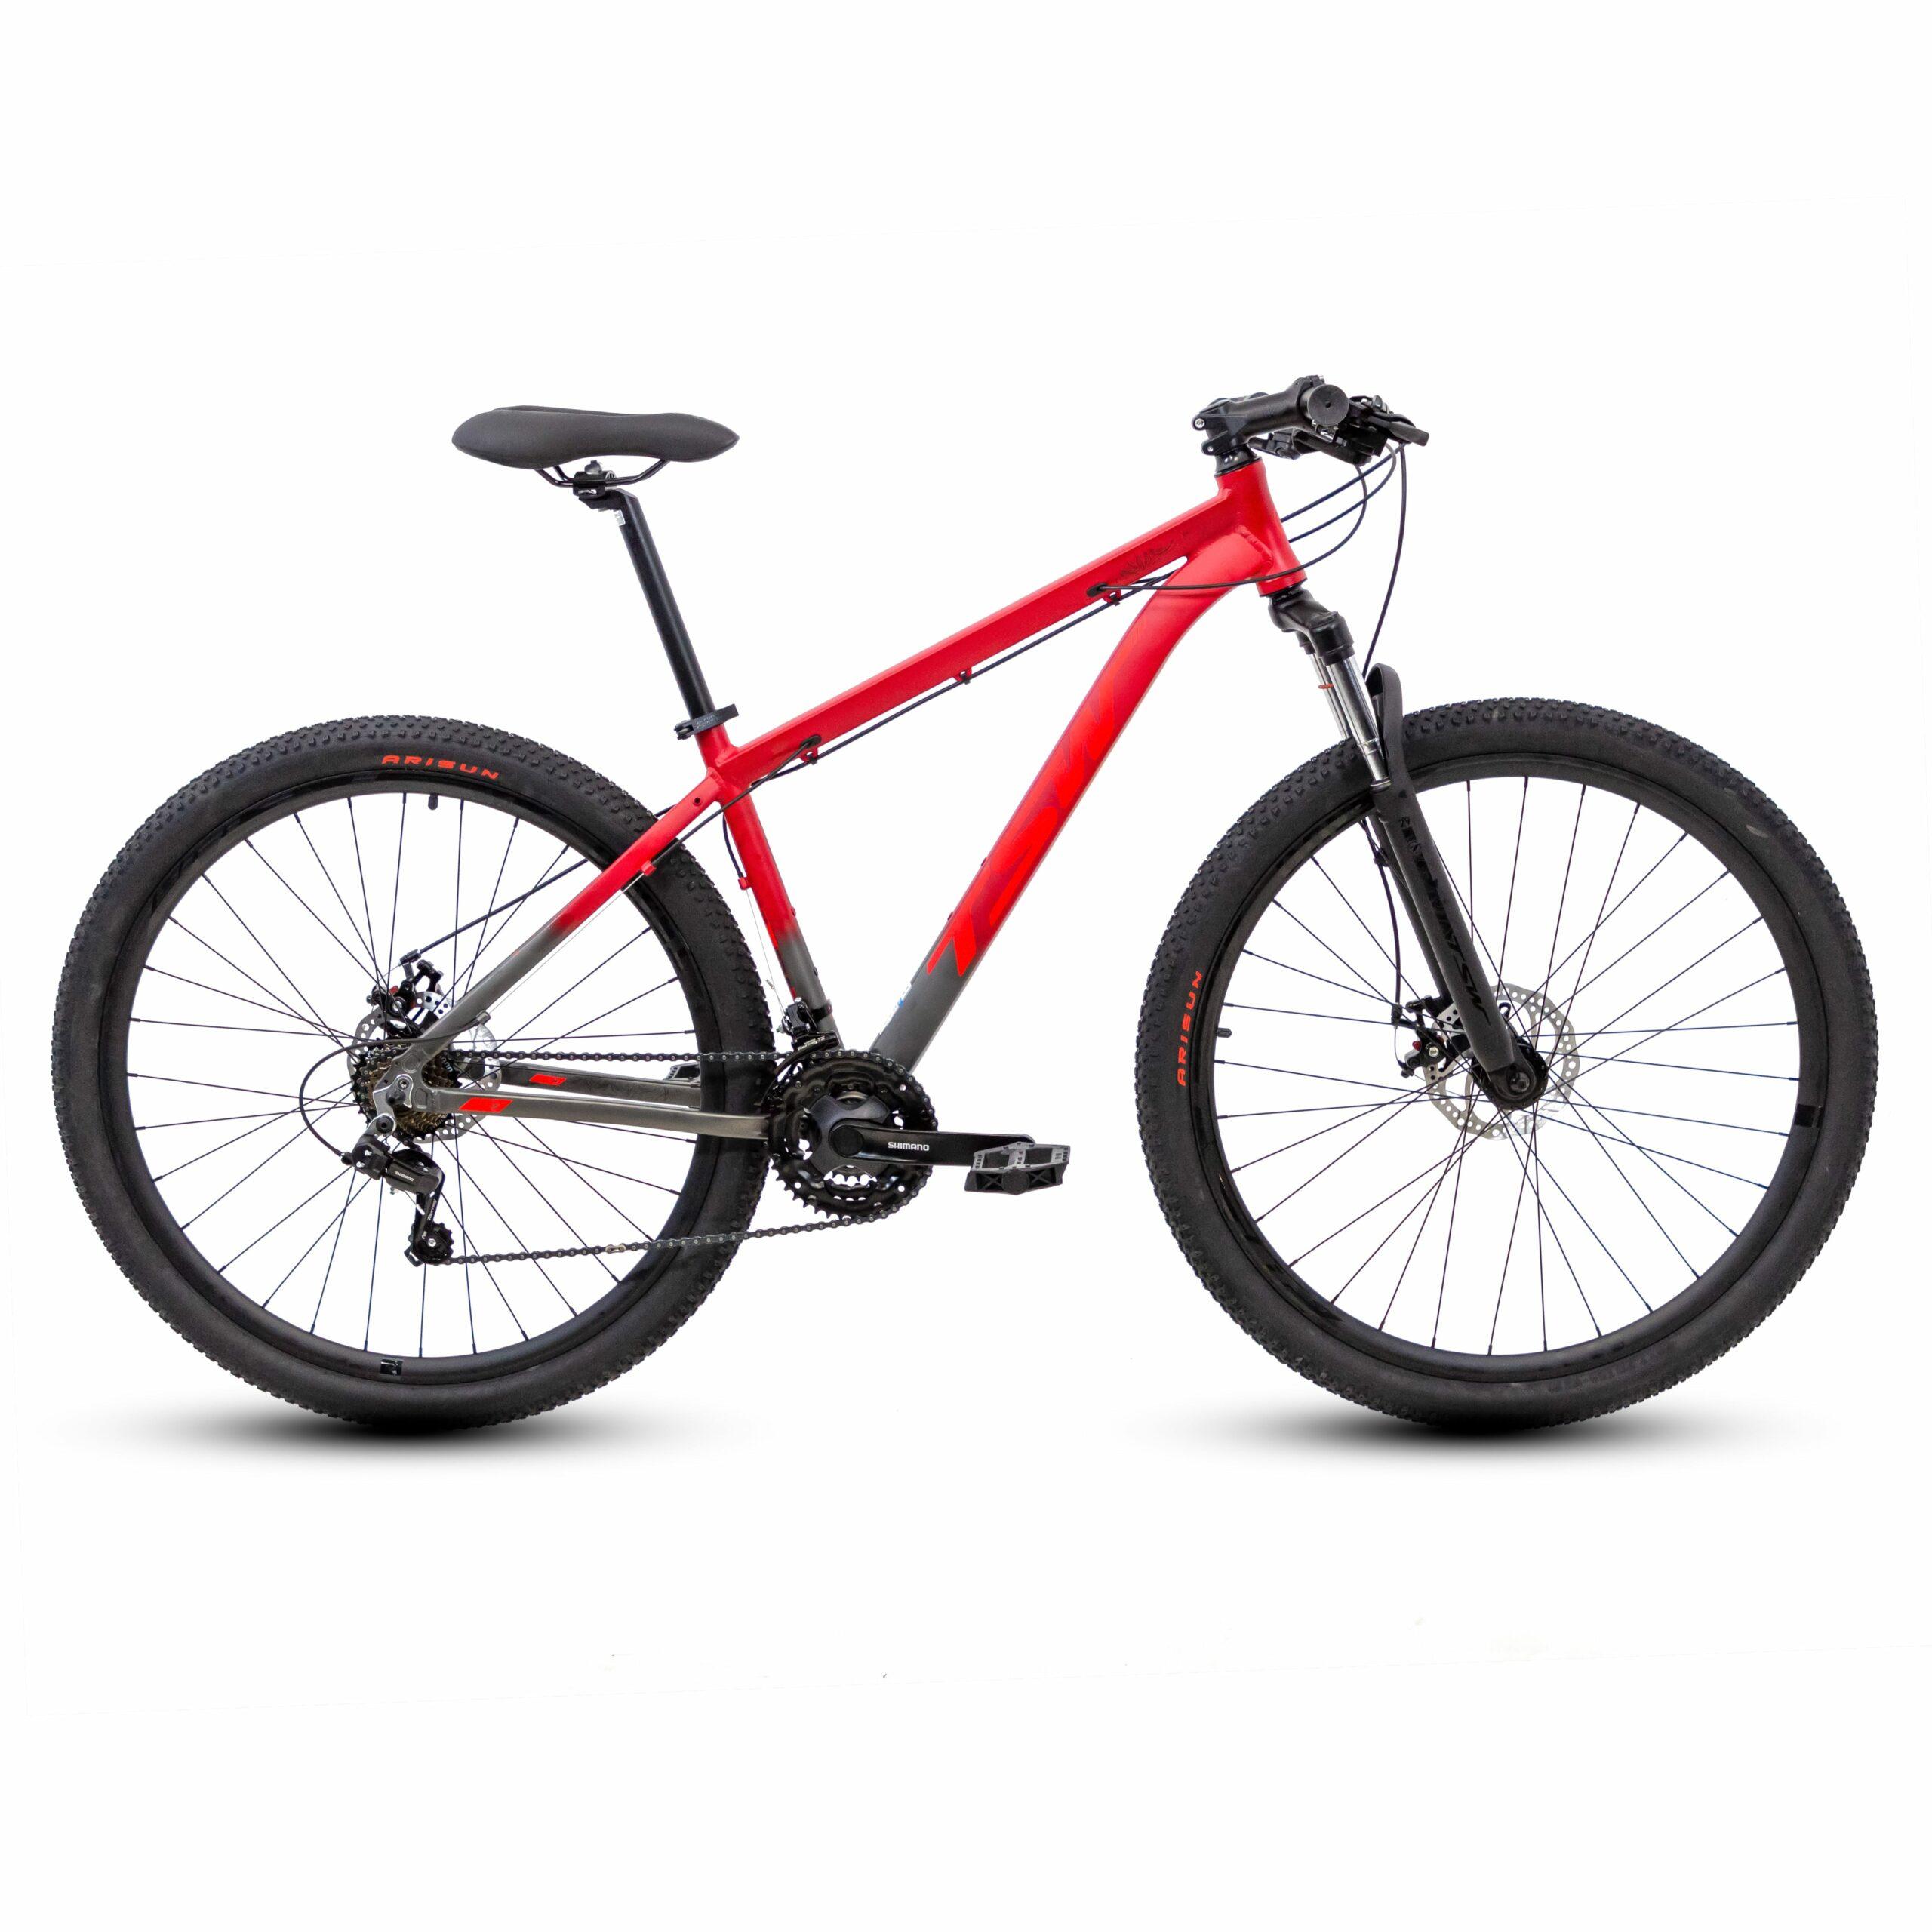 Bicicleta TSW Ride   2021/2022 4